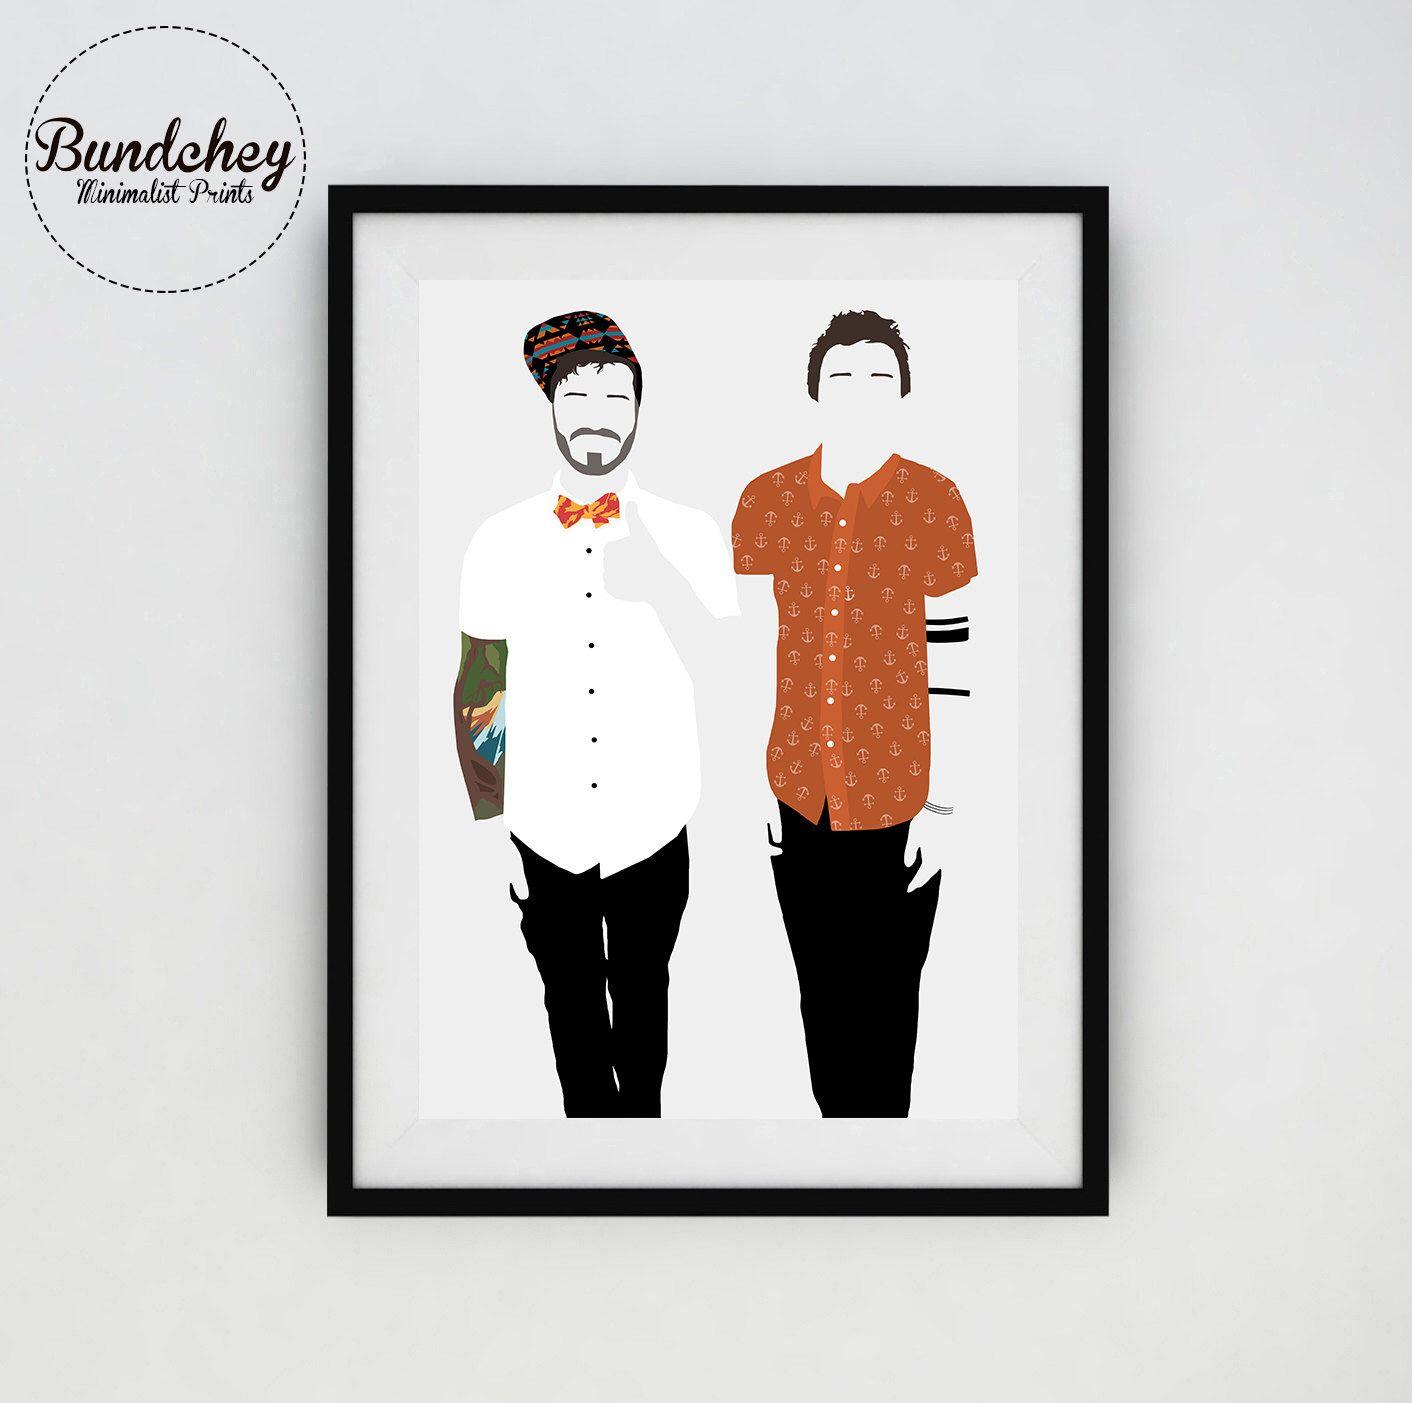 95793cad43149 TWENTY ONE PILOTS - Tyler Joseph and Josh Dun - Minimalist Poster Art by  Bundchey on